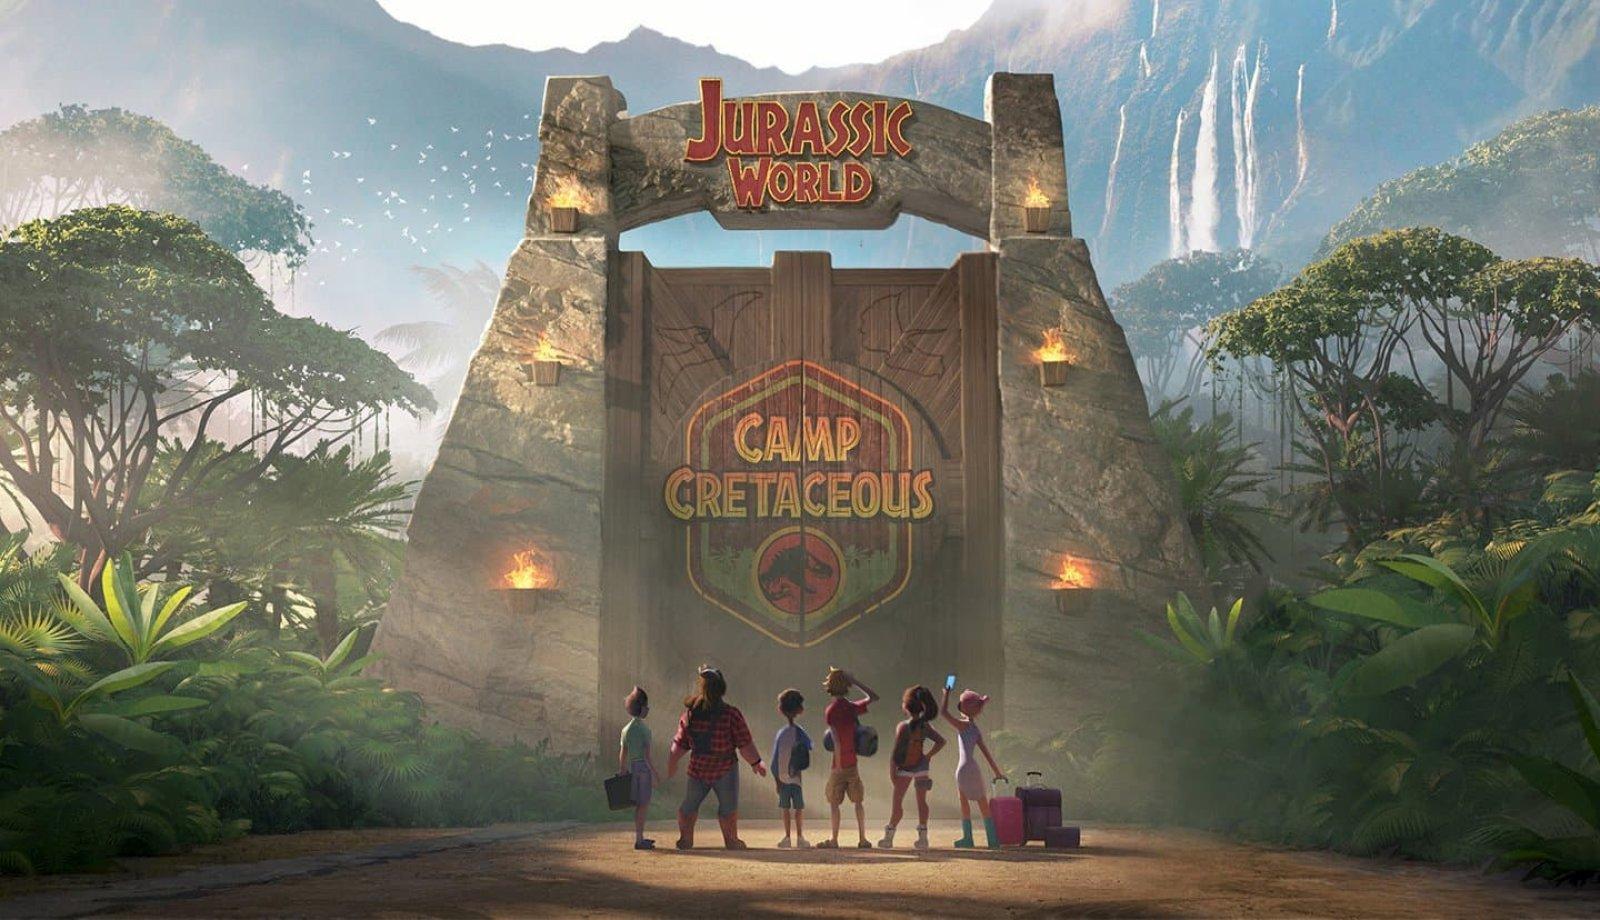 Netflix will unleash a 'Jurassic World' animated series in